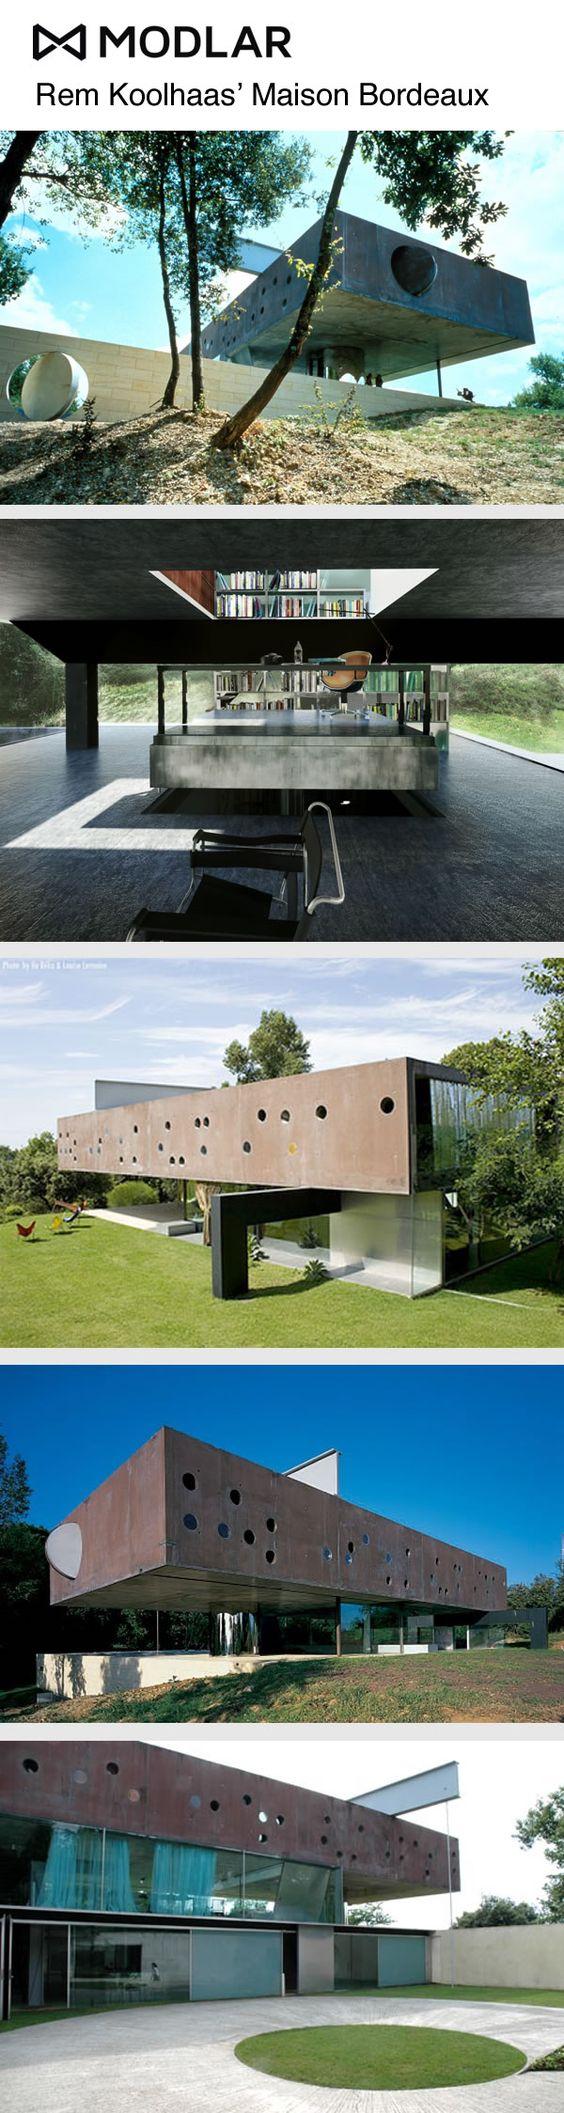 Rem Koolhaas' Maison Bordeaux #Koolhaas Modlar.com